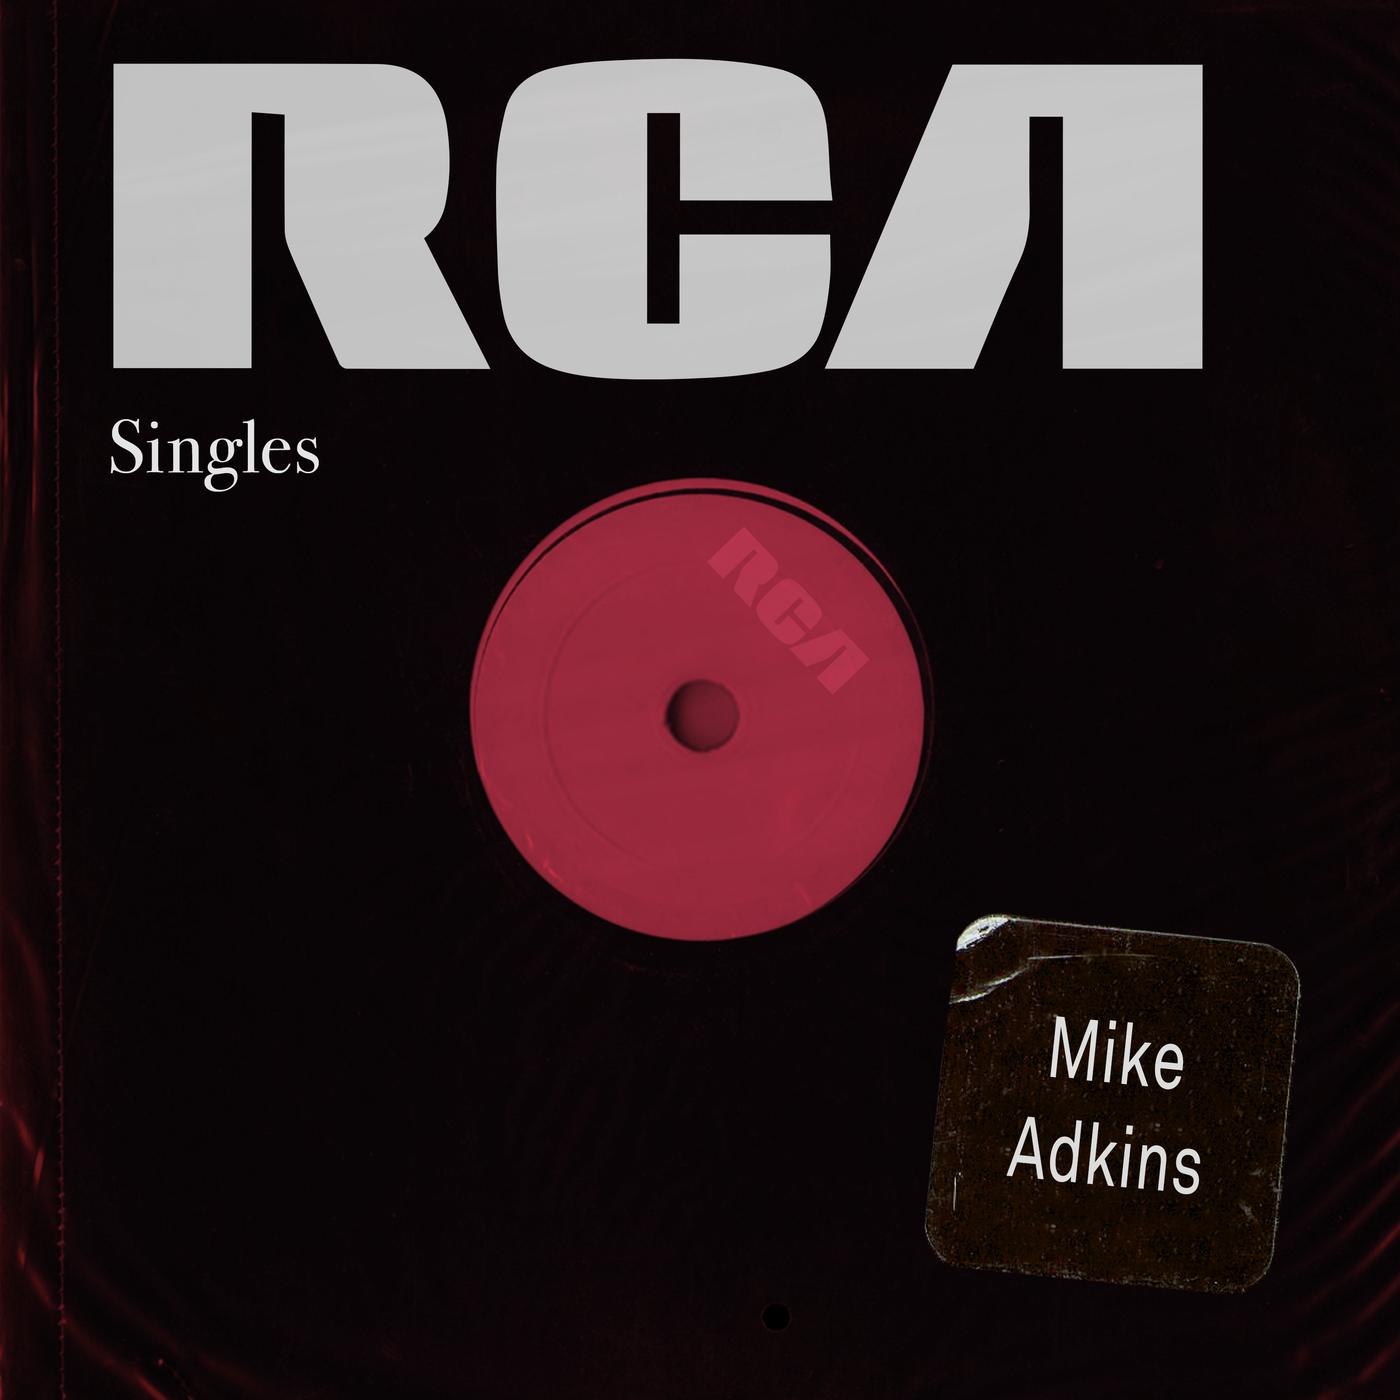 RCA Singles - Mike Adkins